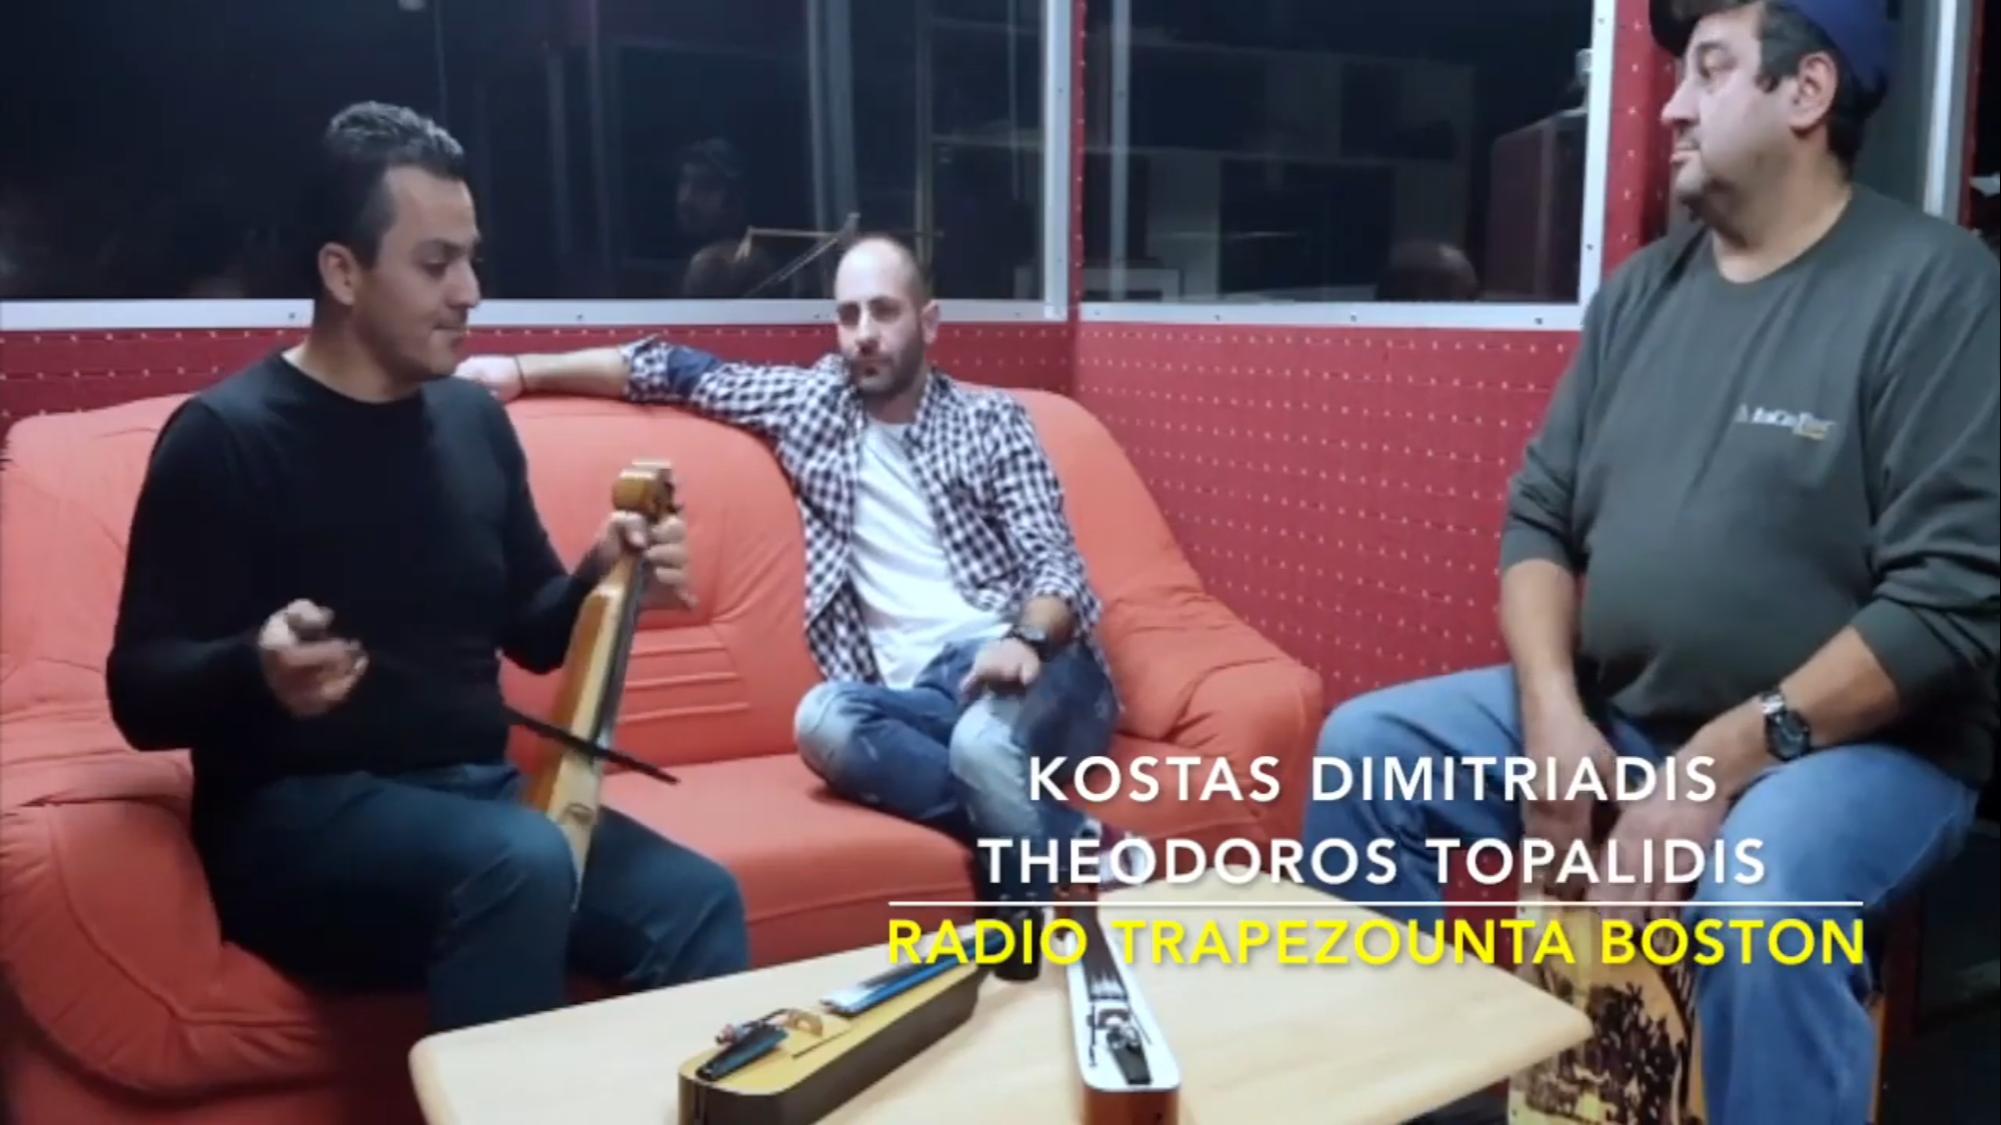 Kostas Dimitriadis & Thodoros Topalidis – Κώστας Δημητριάδης & Θόδωρος Τοπαλίδης